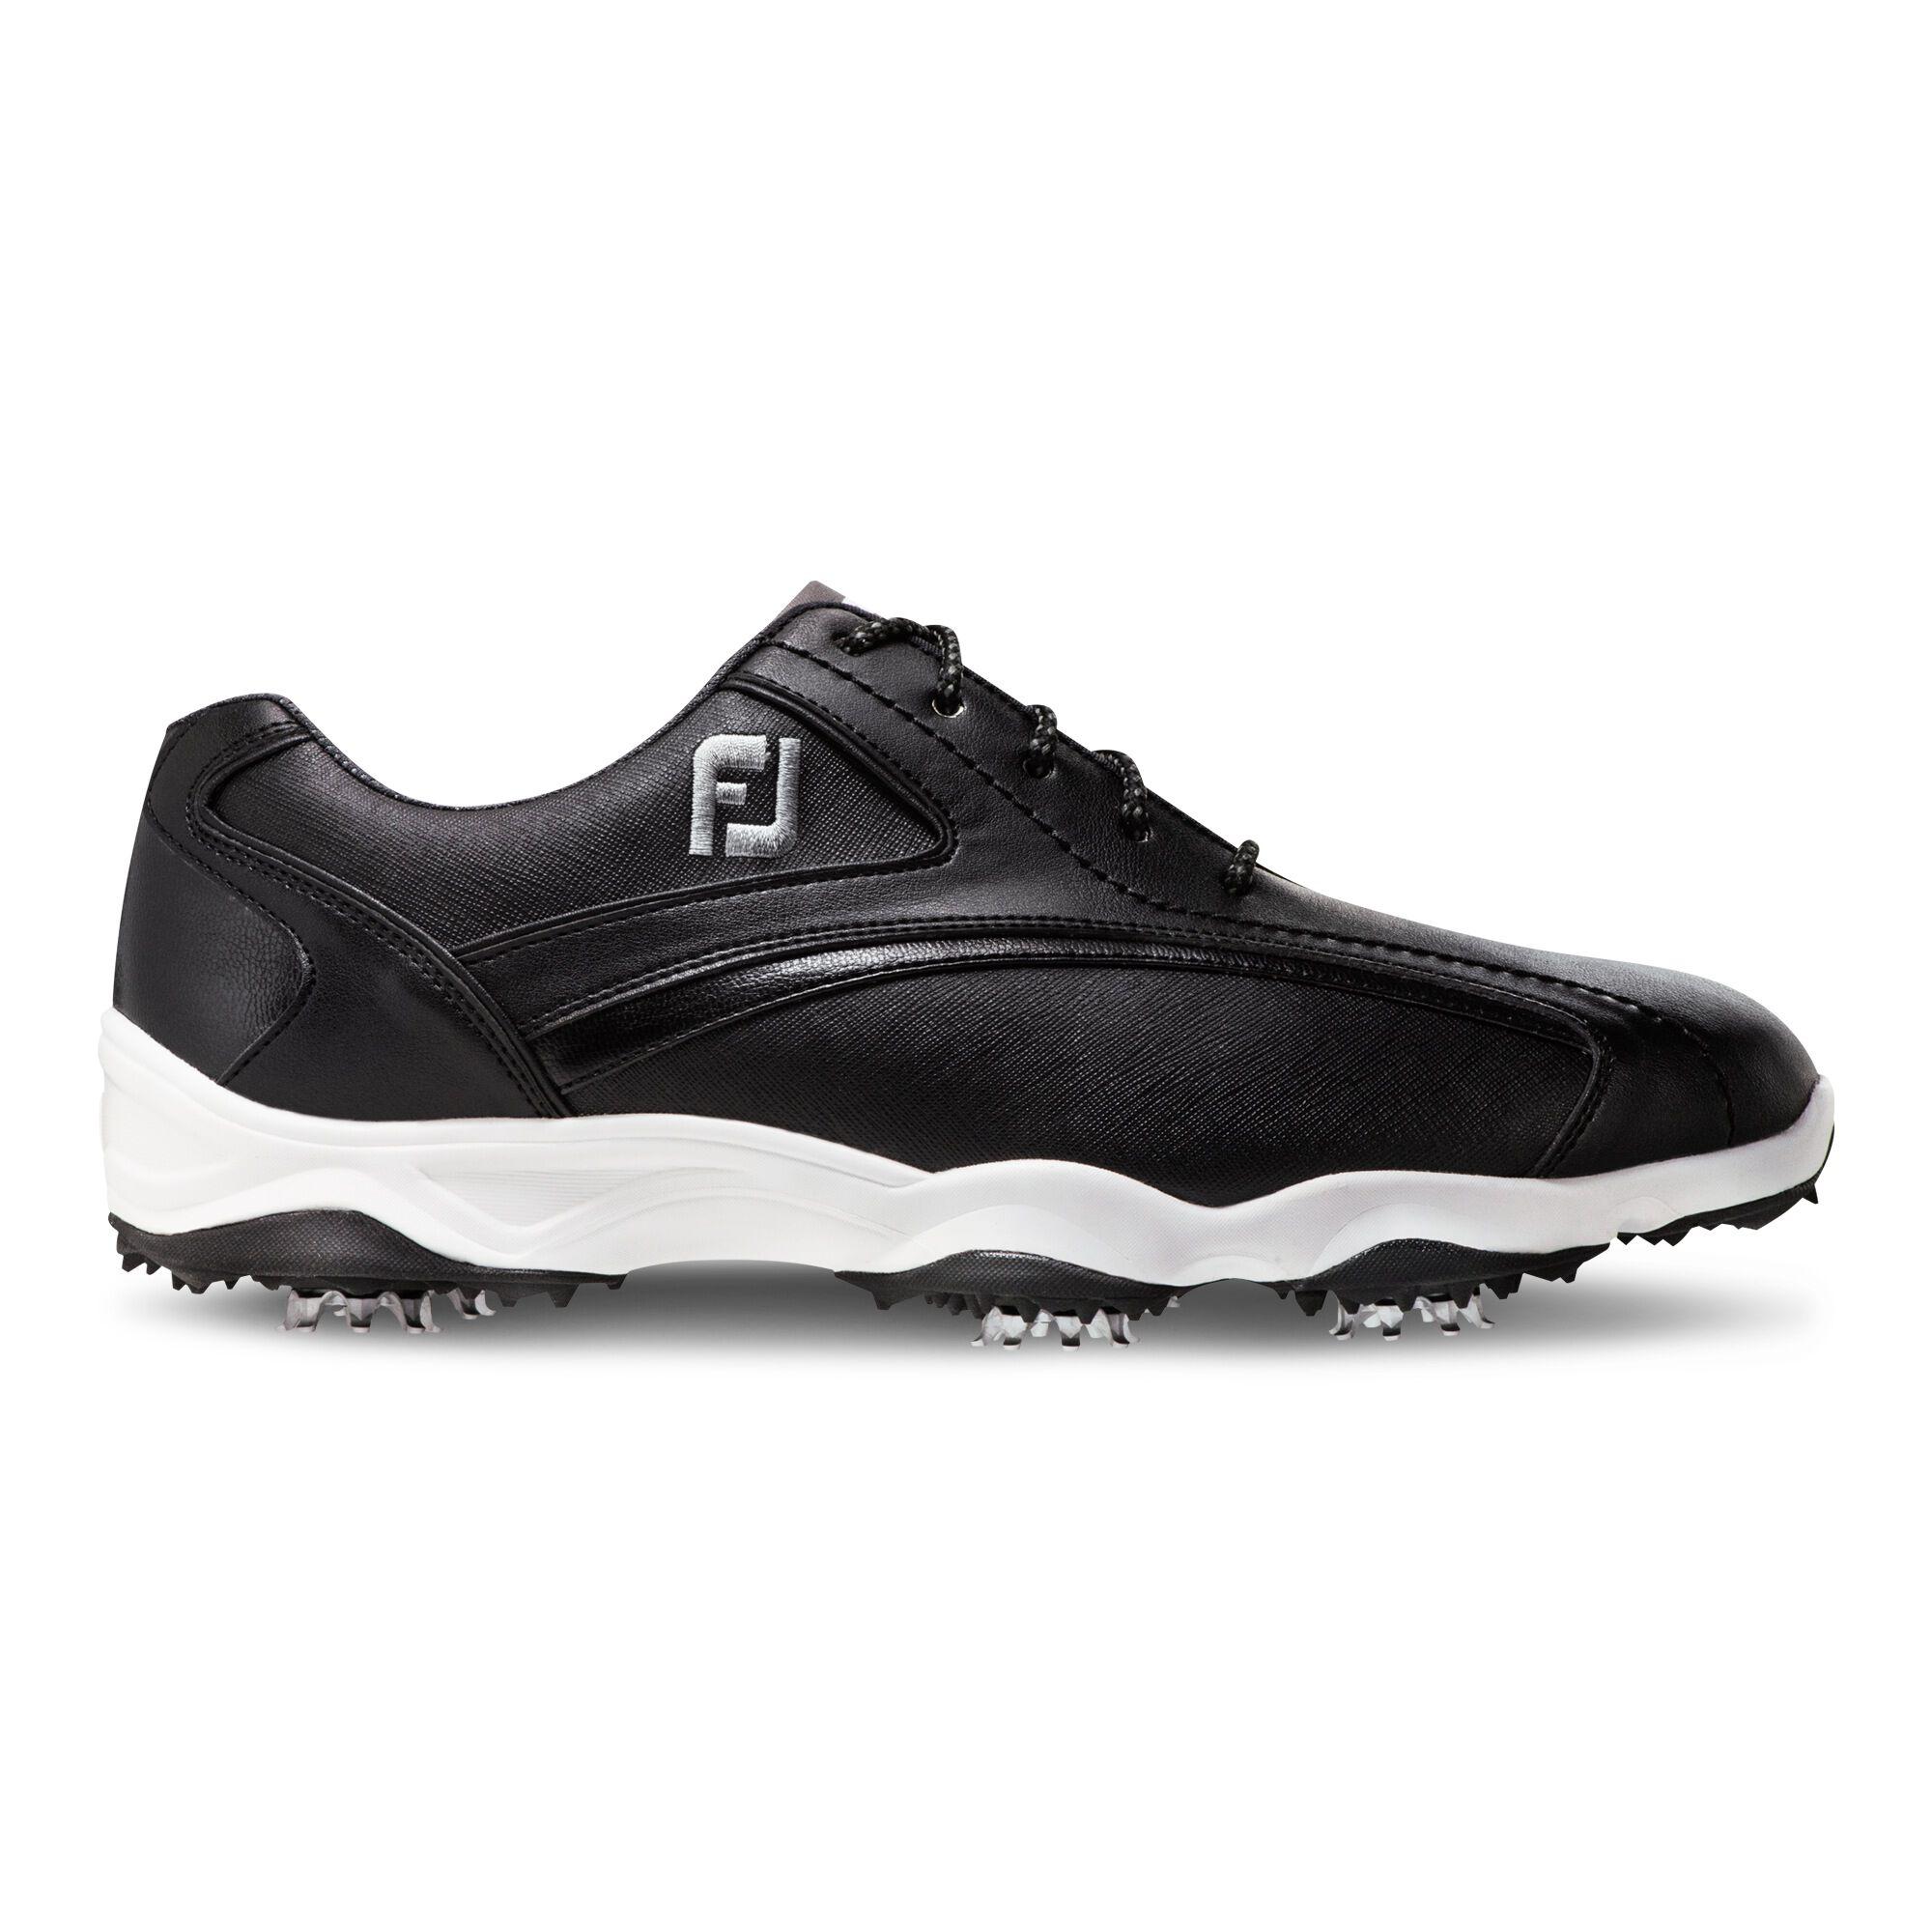 Foot Joy Enjoy Spikeless Engineered Black ZMn J8m L1